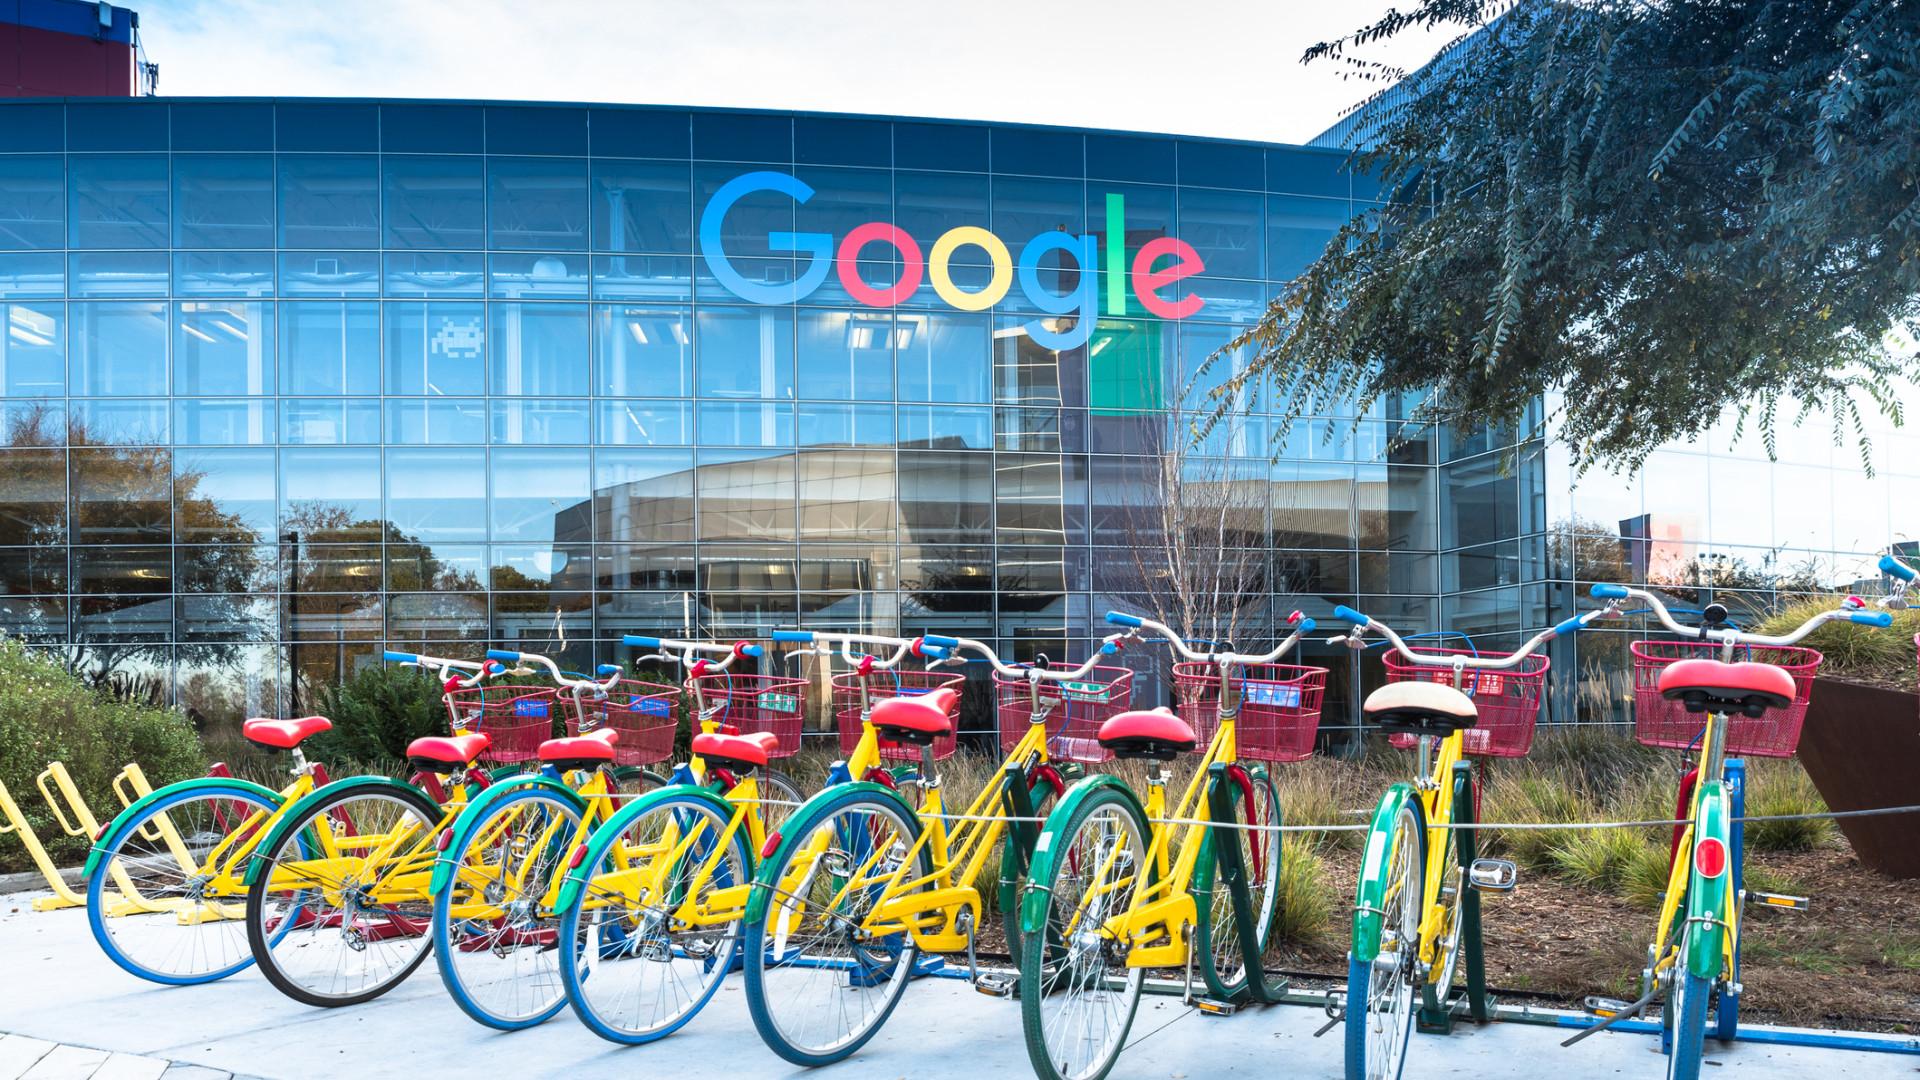 Trump diz que Google planeja manipular eleições de 2020